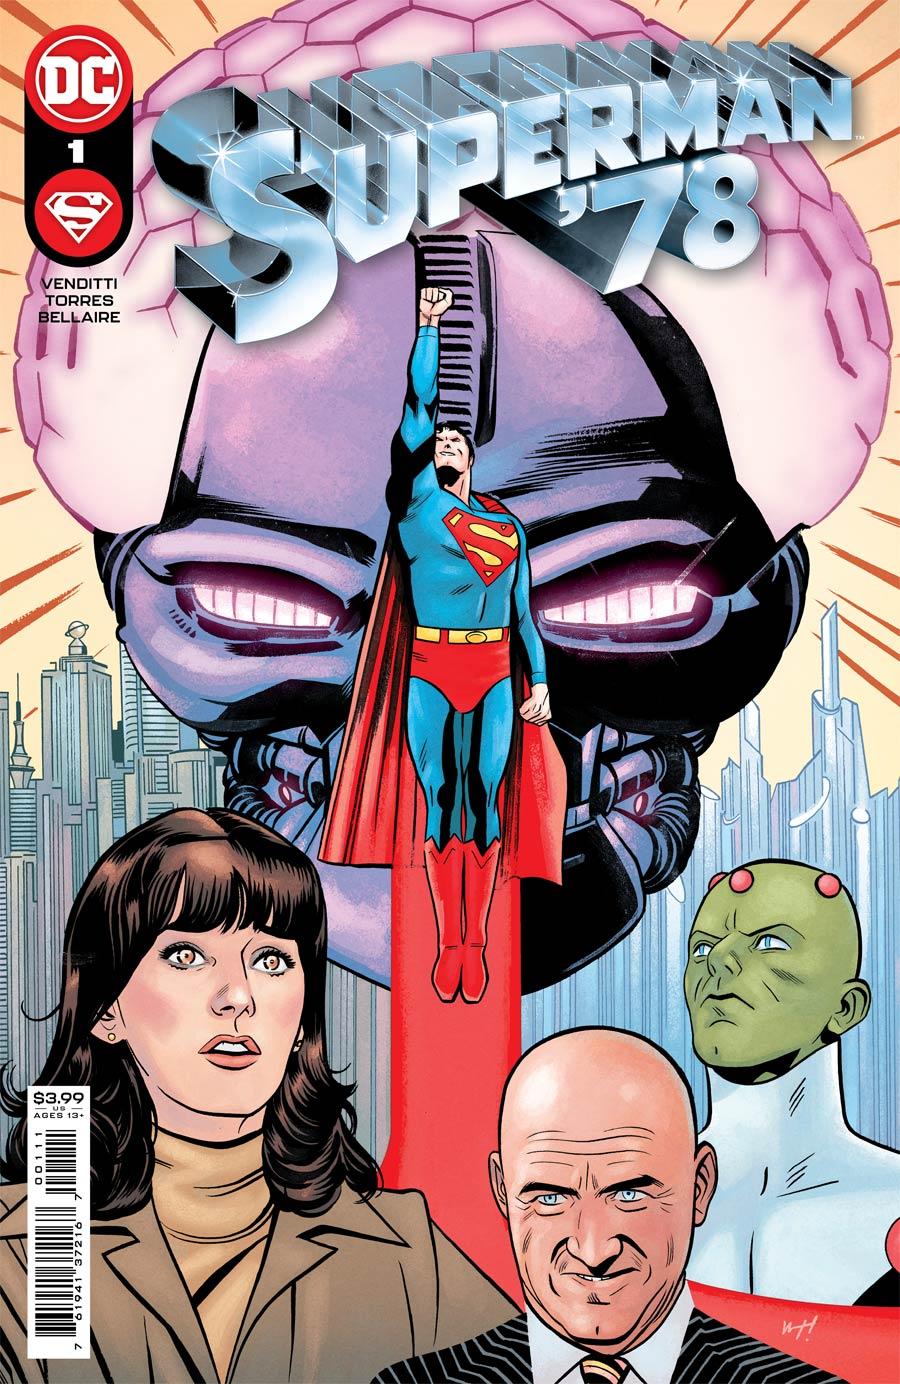 Superman 78 #1 Cover A Regular Wilfredo Torres Cover